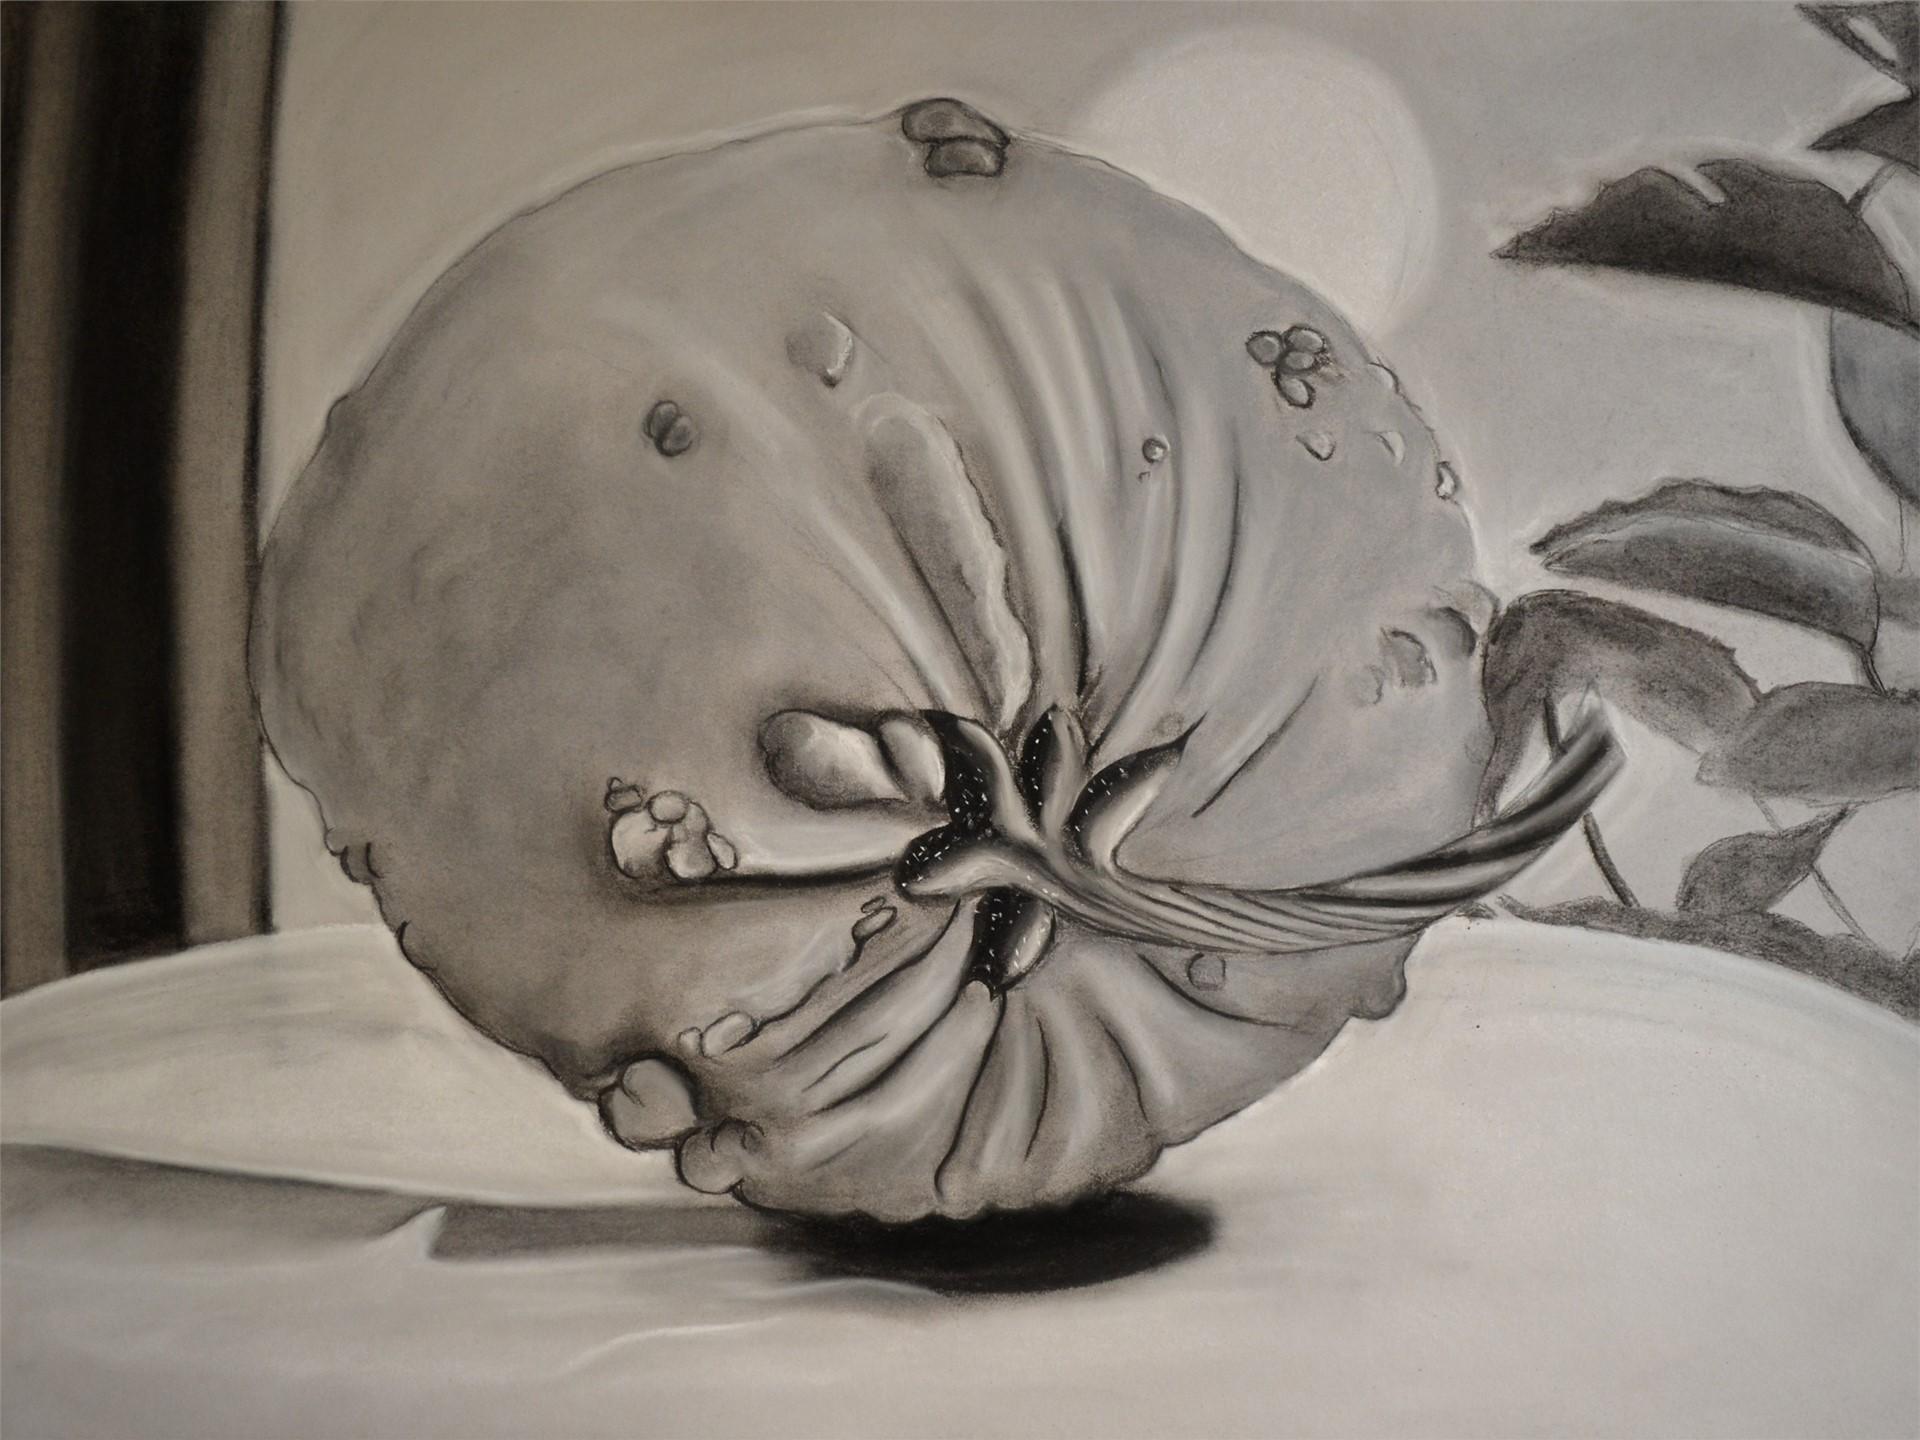 COURTNEY SMITH, Pumpkin, charcoal on gray bogus, 18 x 24, 2015